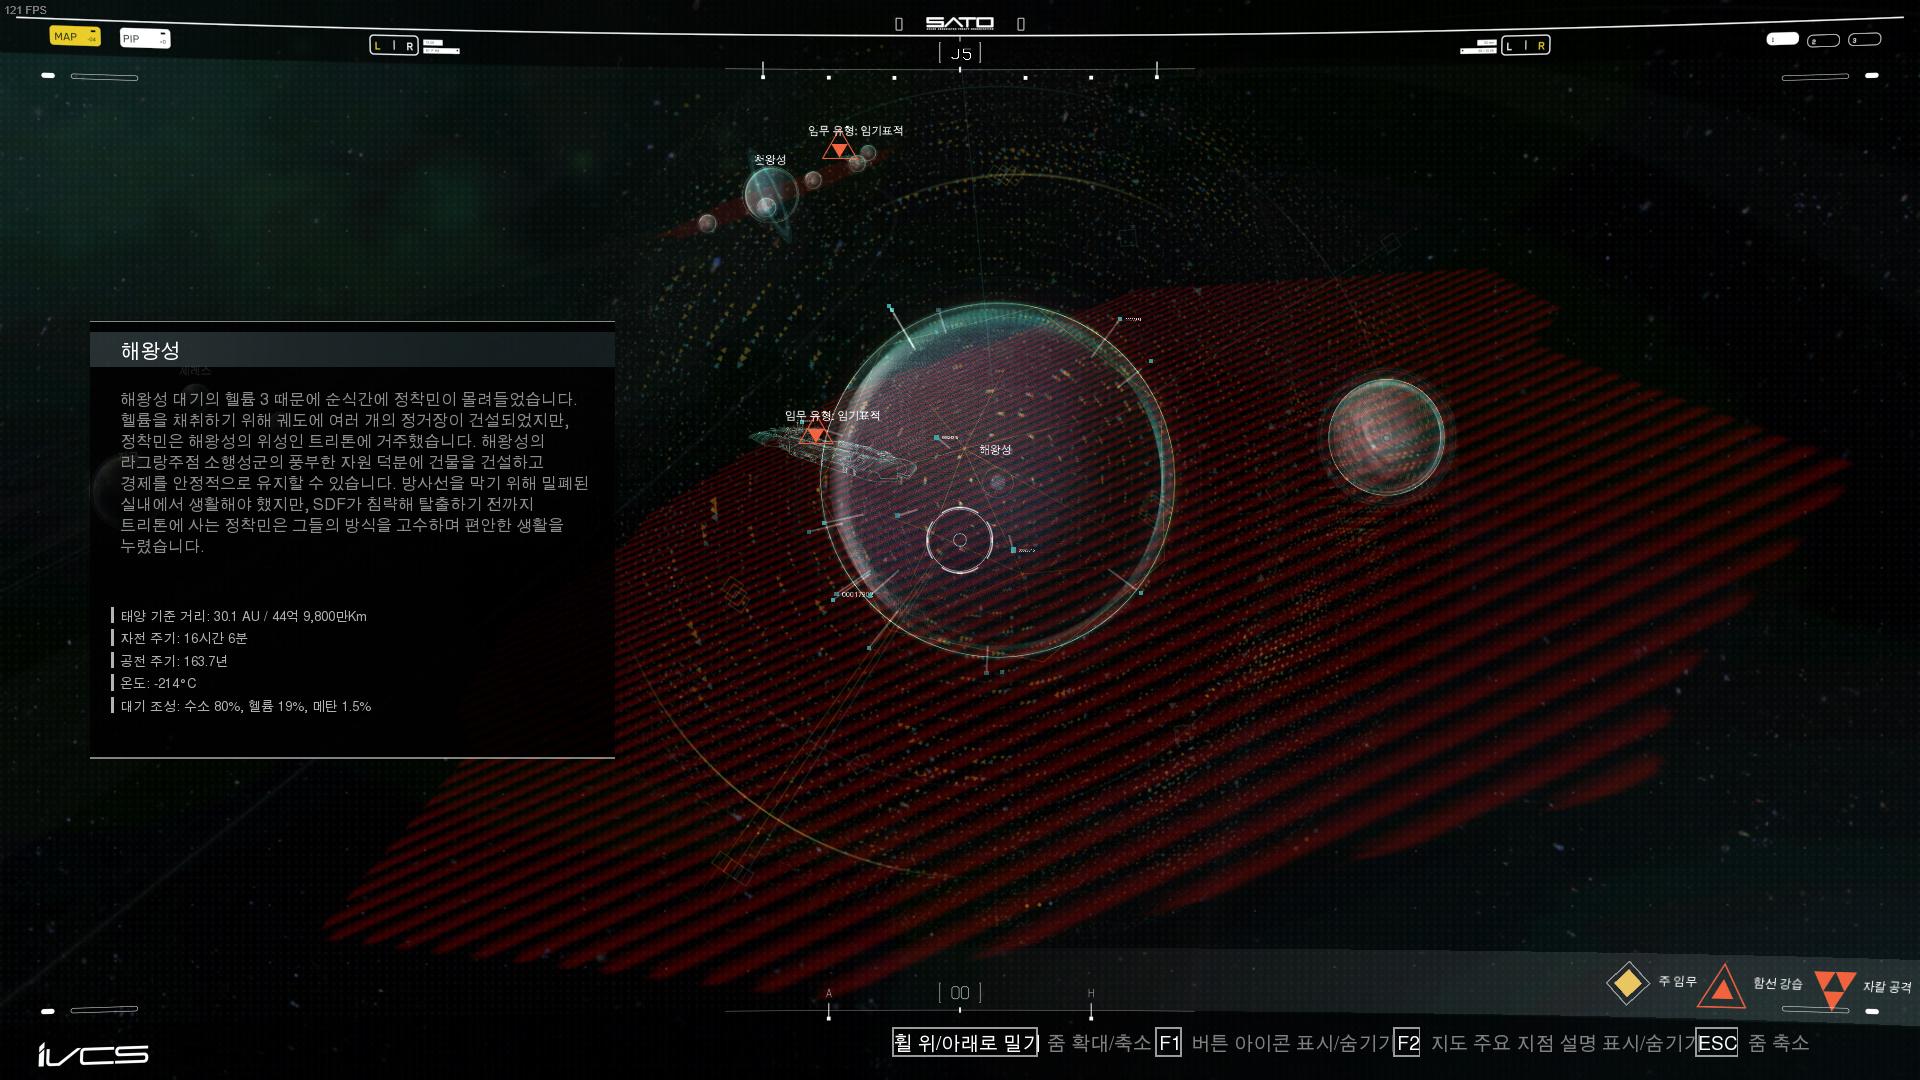 iw7_ship 2017-10-12 07-12-51-164.jpg